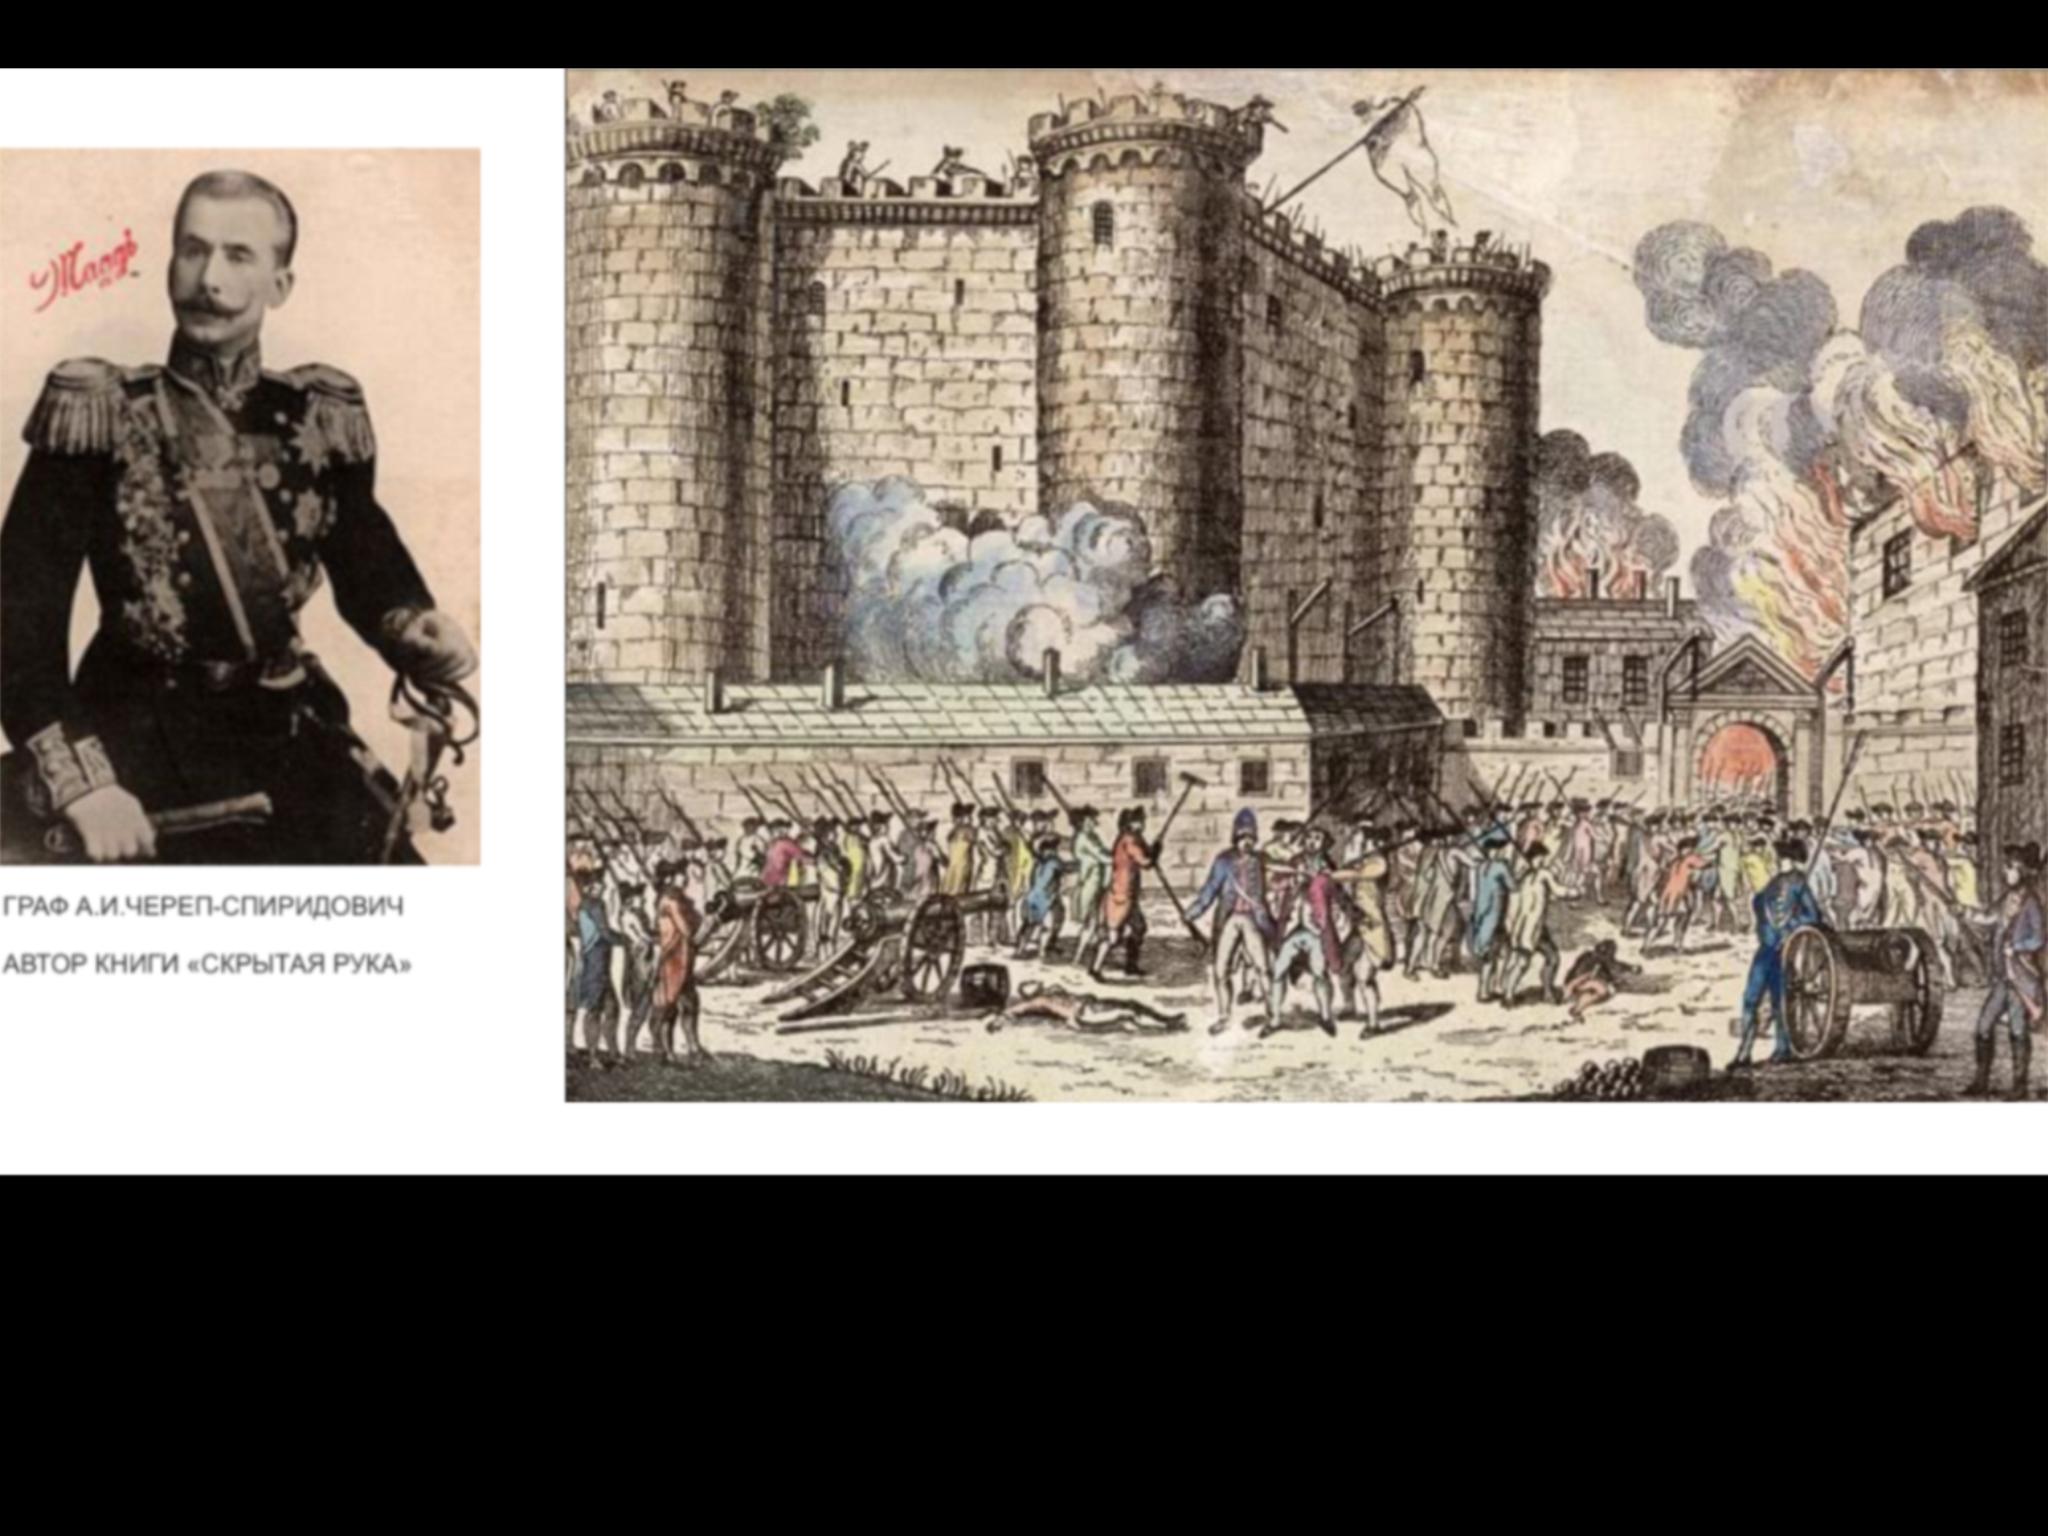 Скрытая рука. Французская Революция и Ротшильды.